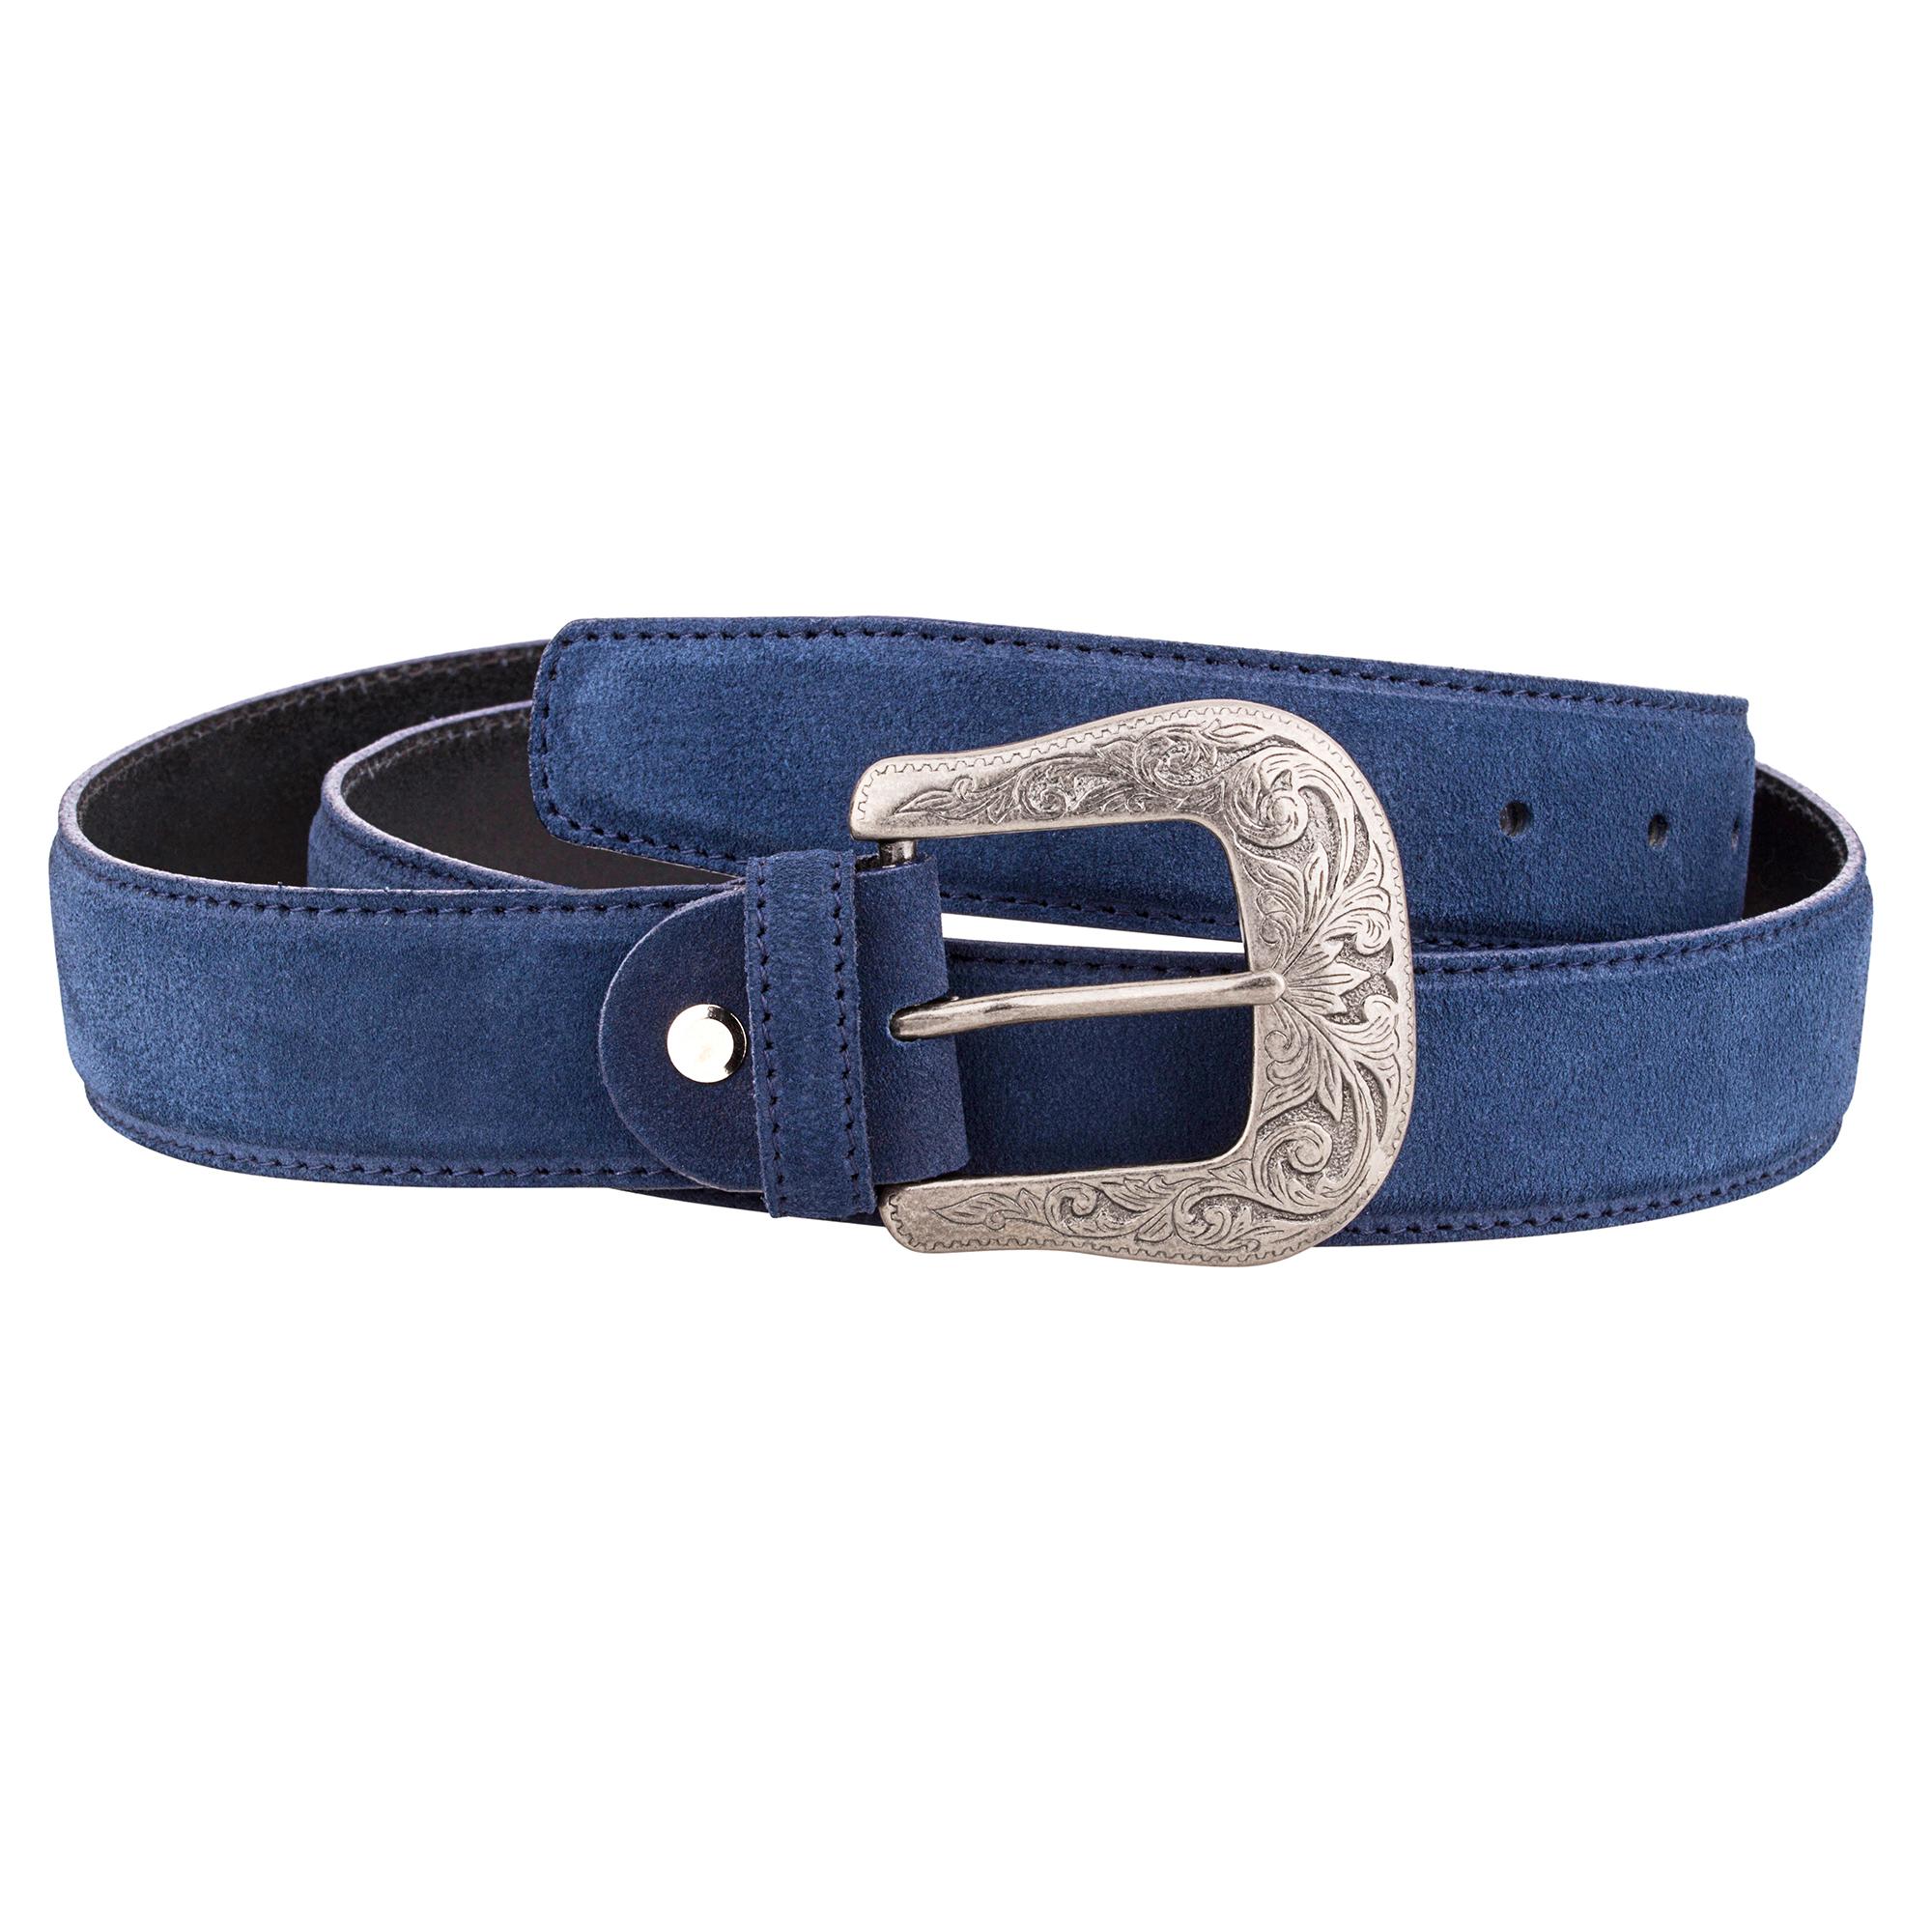 Mens Western Belts Antique silver belt buckles Cowboy Cowgirl Blue ...